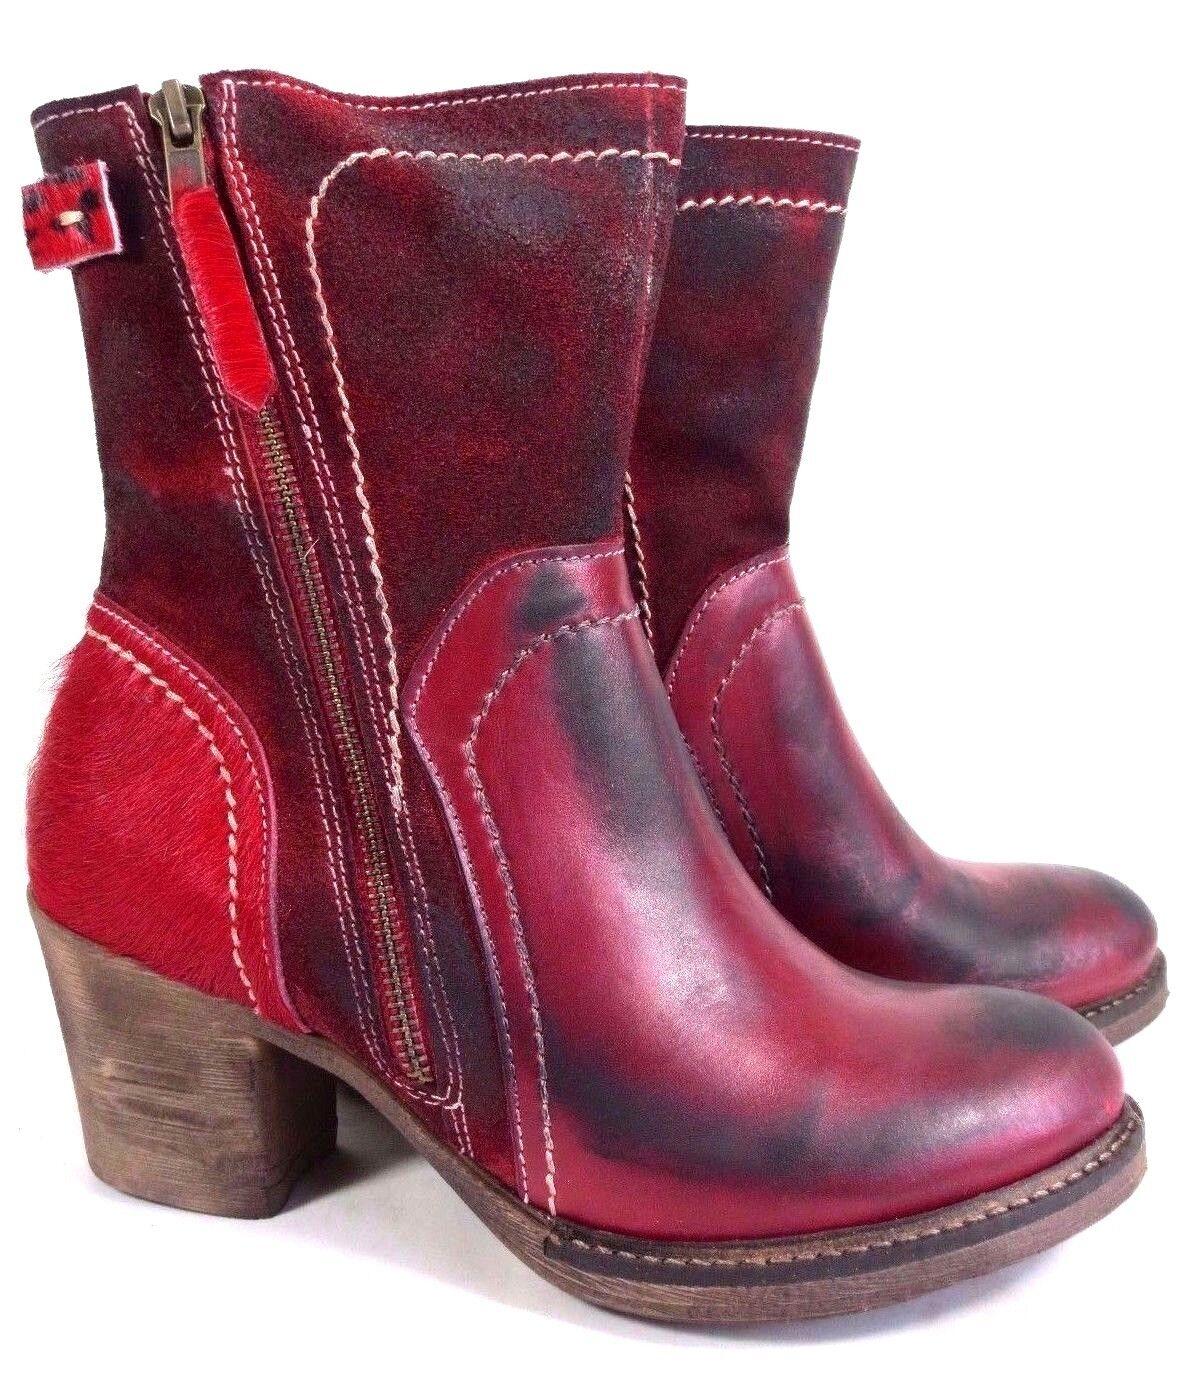 IQ originales Chaussures en Cuir Bottines rouge avec fourrure Antique Look Neuf 159,95